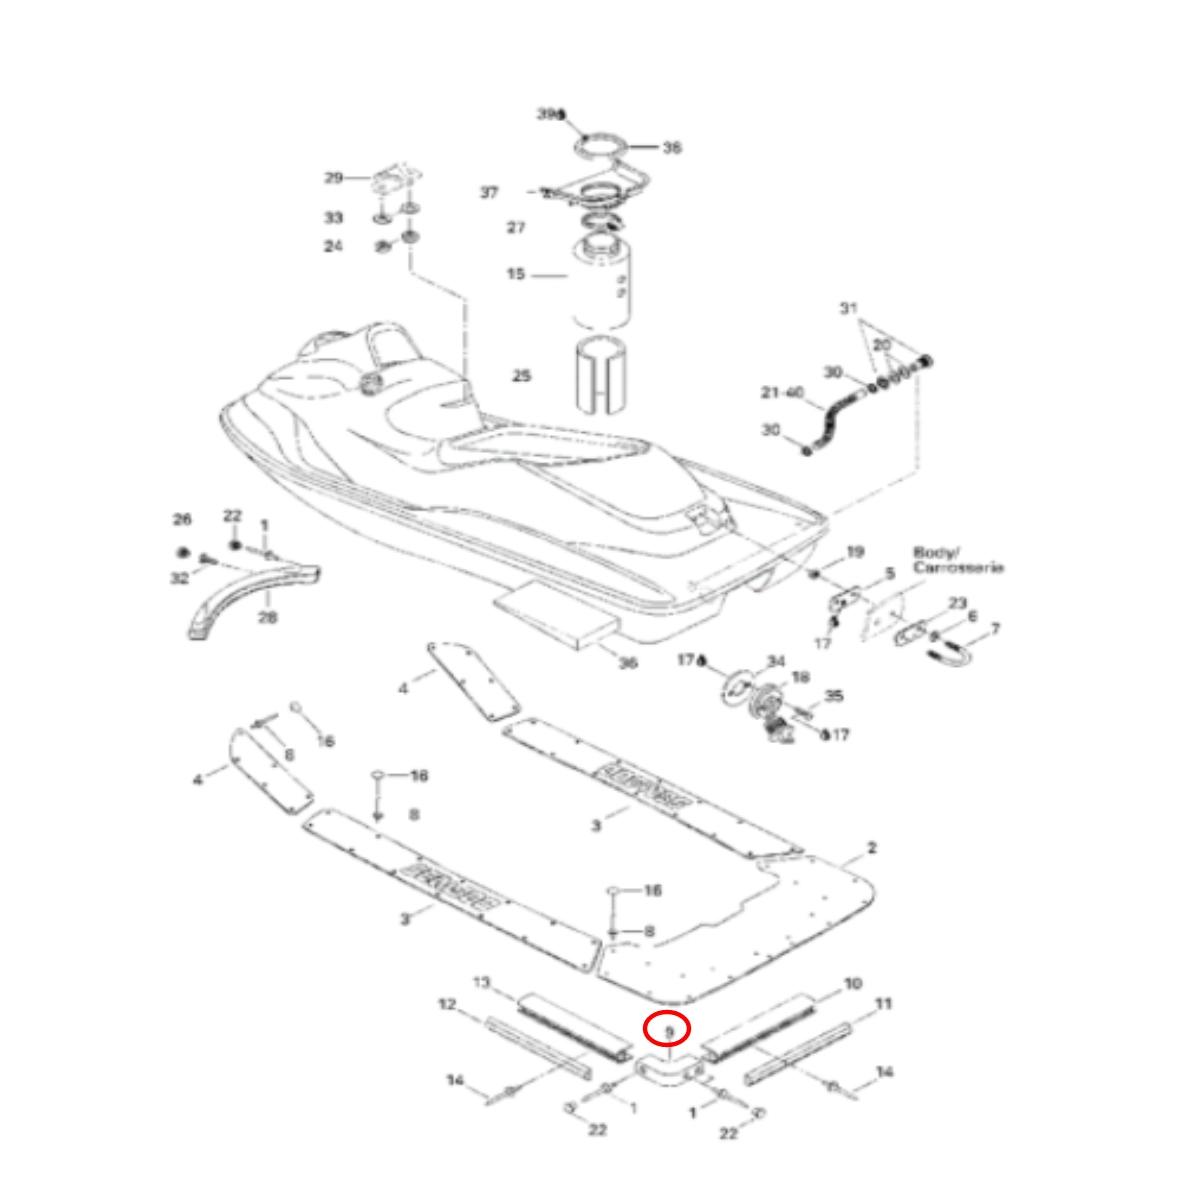 Cantoneira para Jet ski Sea Doo GS/GTI/GTX/RXP/RXT (505)  - Radical Peças - Peças para Jet Ski